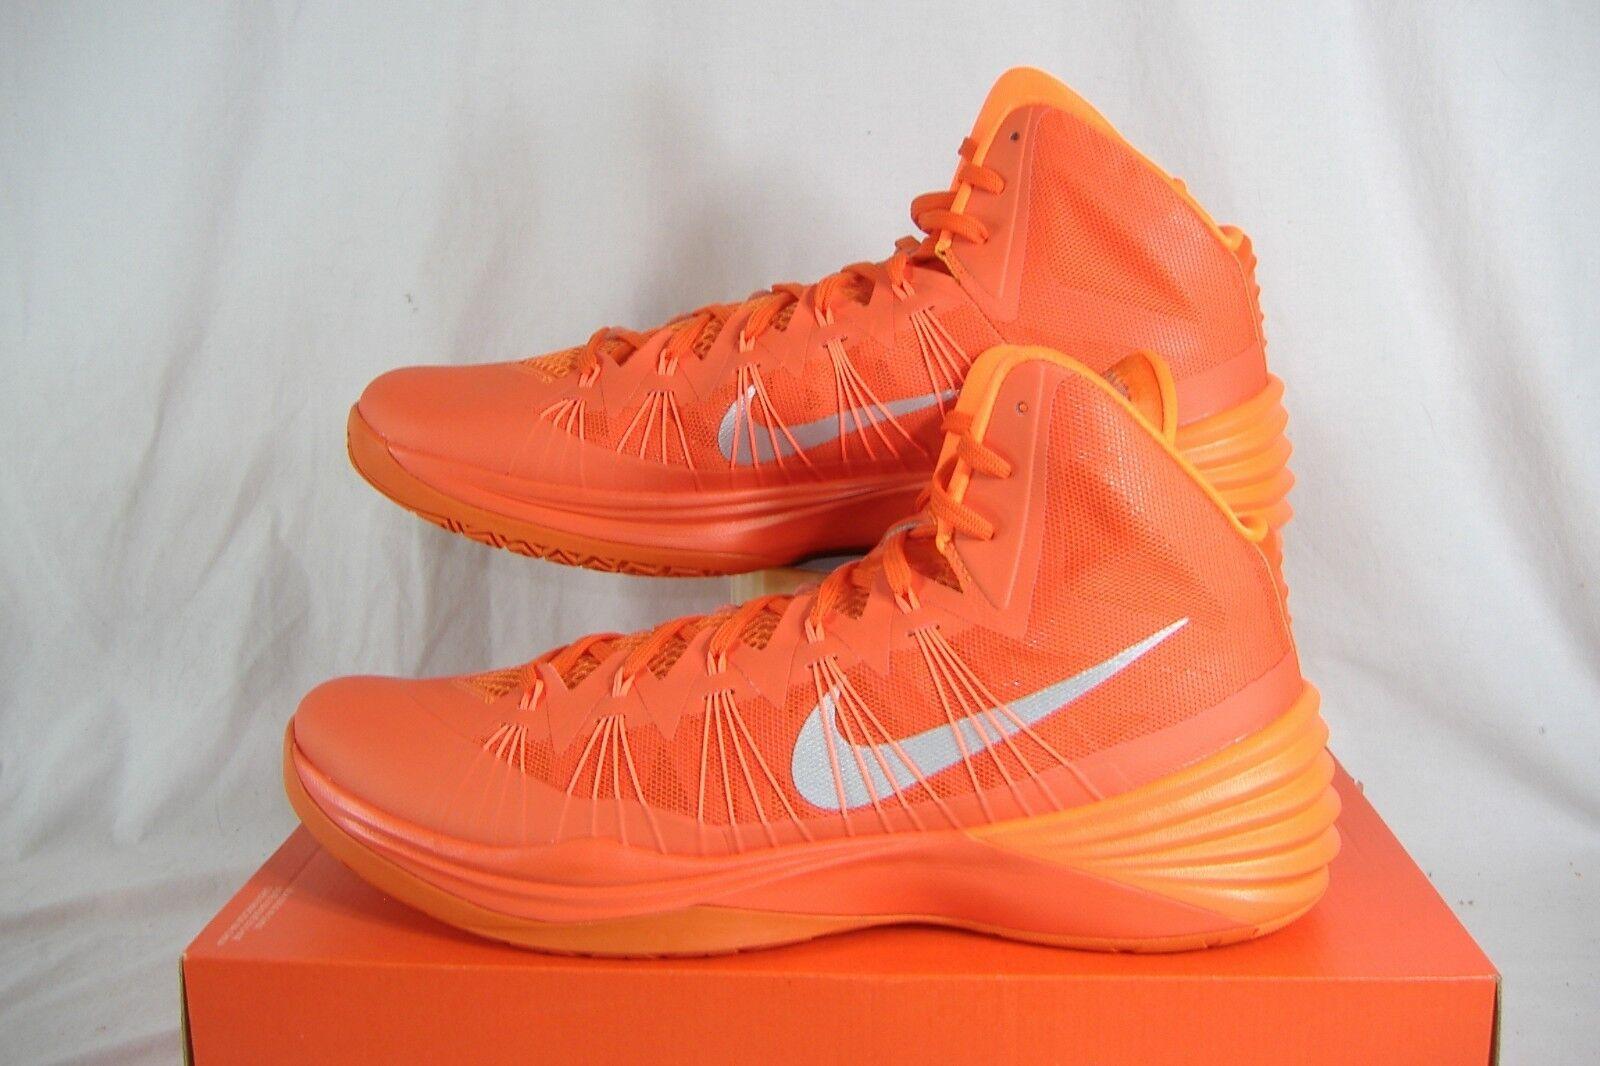 Uomo 18 nike hyperdunk 2013 tbc arancione e alte scarpe da basket 584433-800